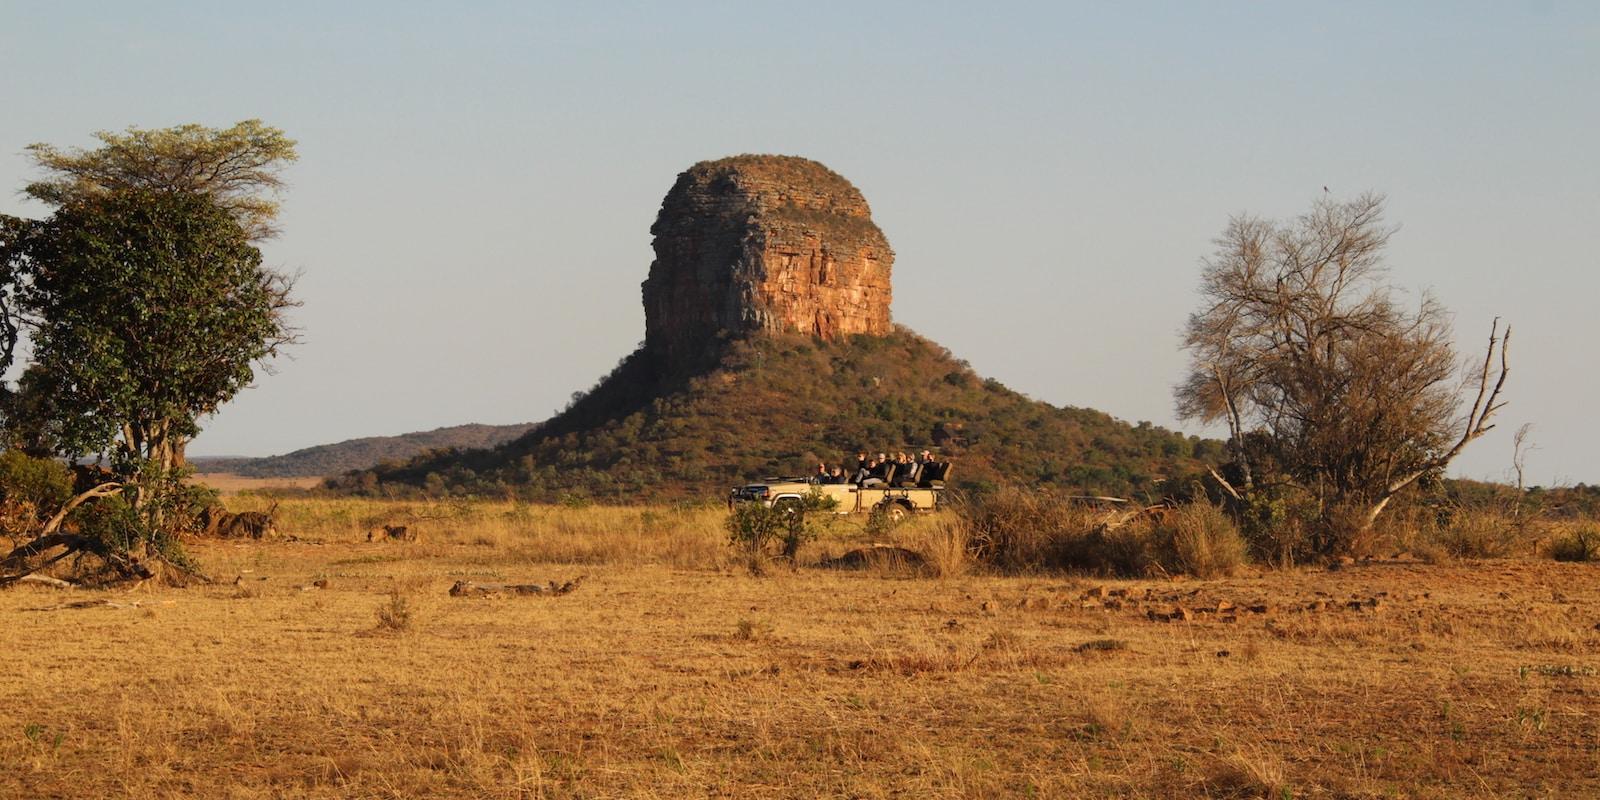 Safari open top vehicle